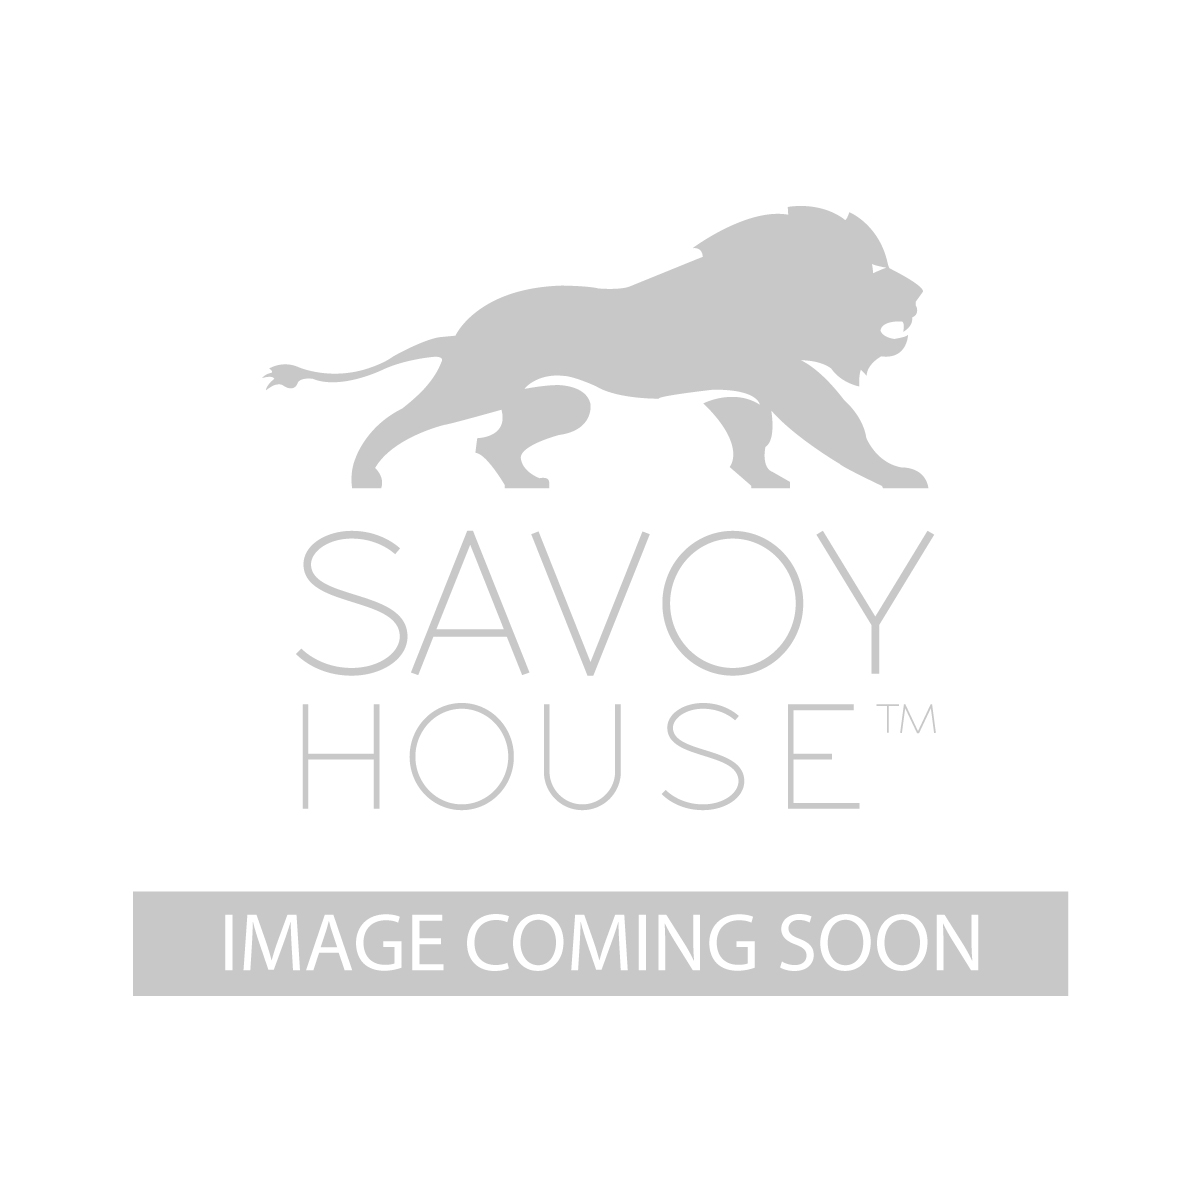 Odessa 5 Light Pendant  sc 1 st  Savoy House & 7-160-5-61 Odessa 5 Light Pendant by Savoy House